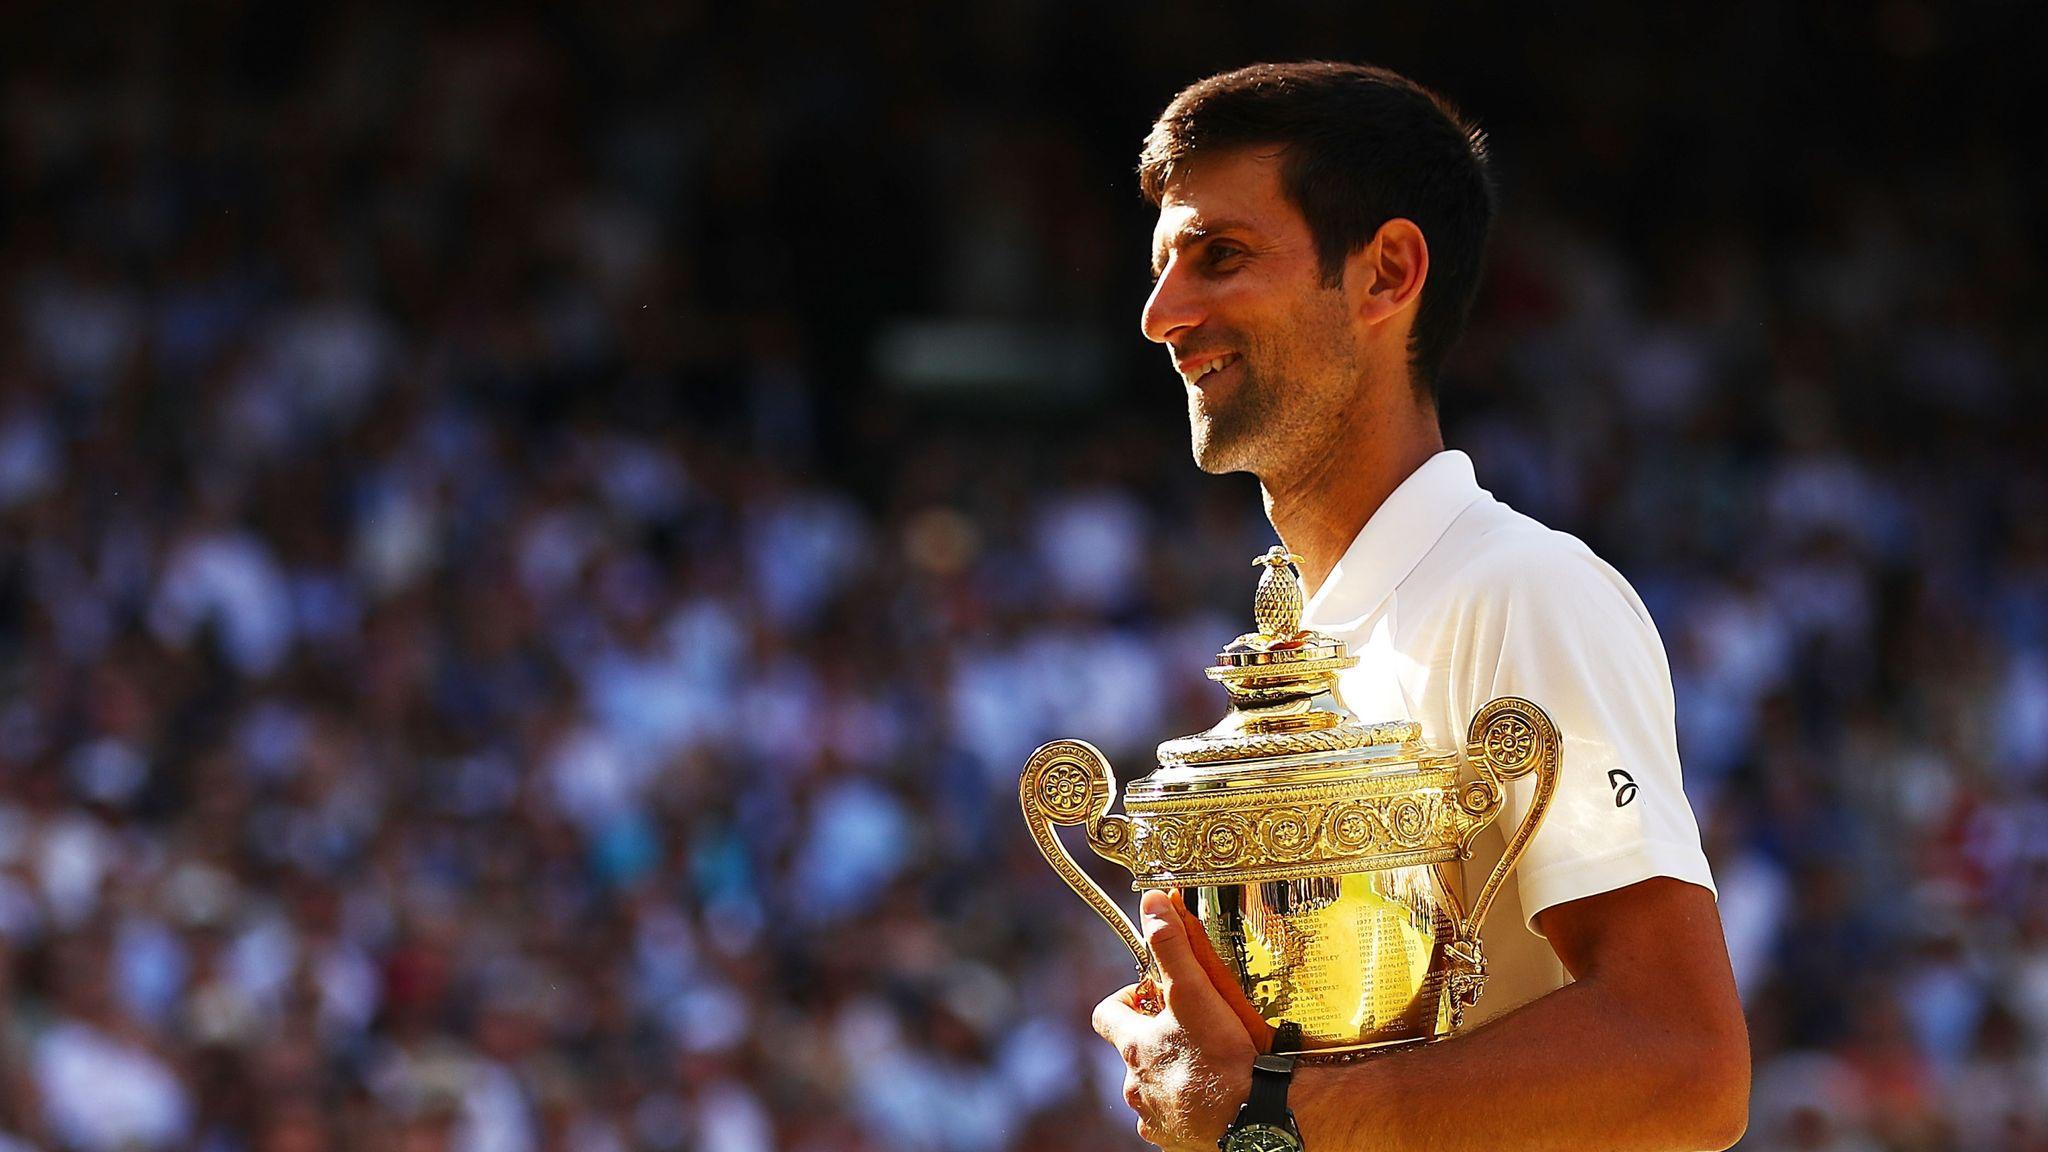 Djokovic Defeats Anderson In Straight Sets To Win Wimbledon News Uk Video News Sky News